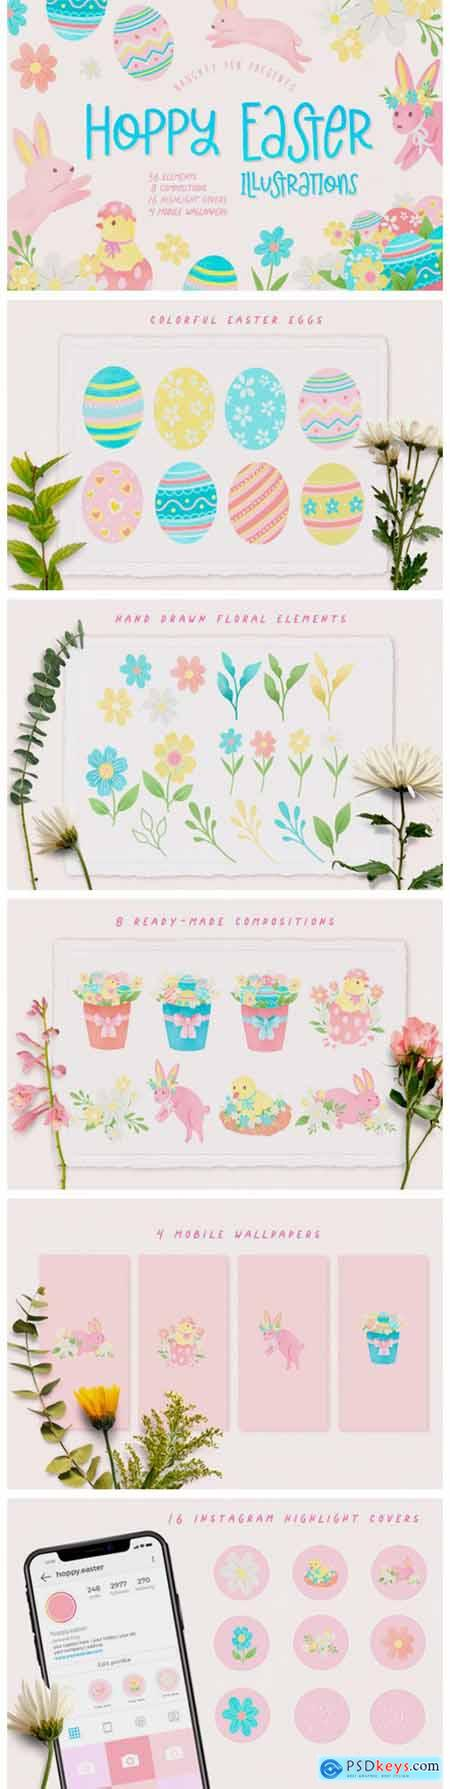 Hoppy Easter Spring Bunnies Illustration 8638459